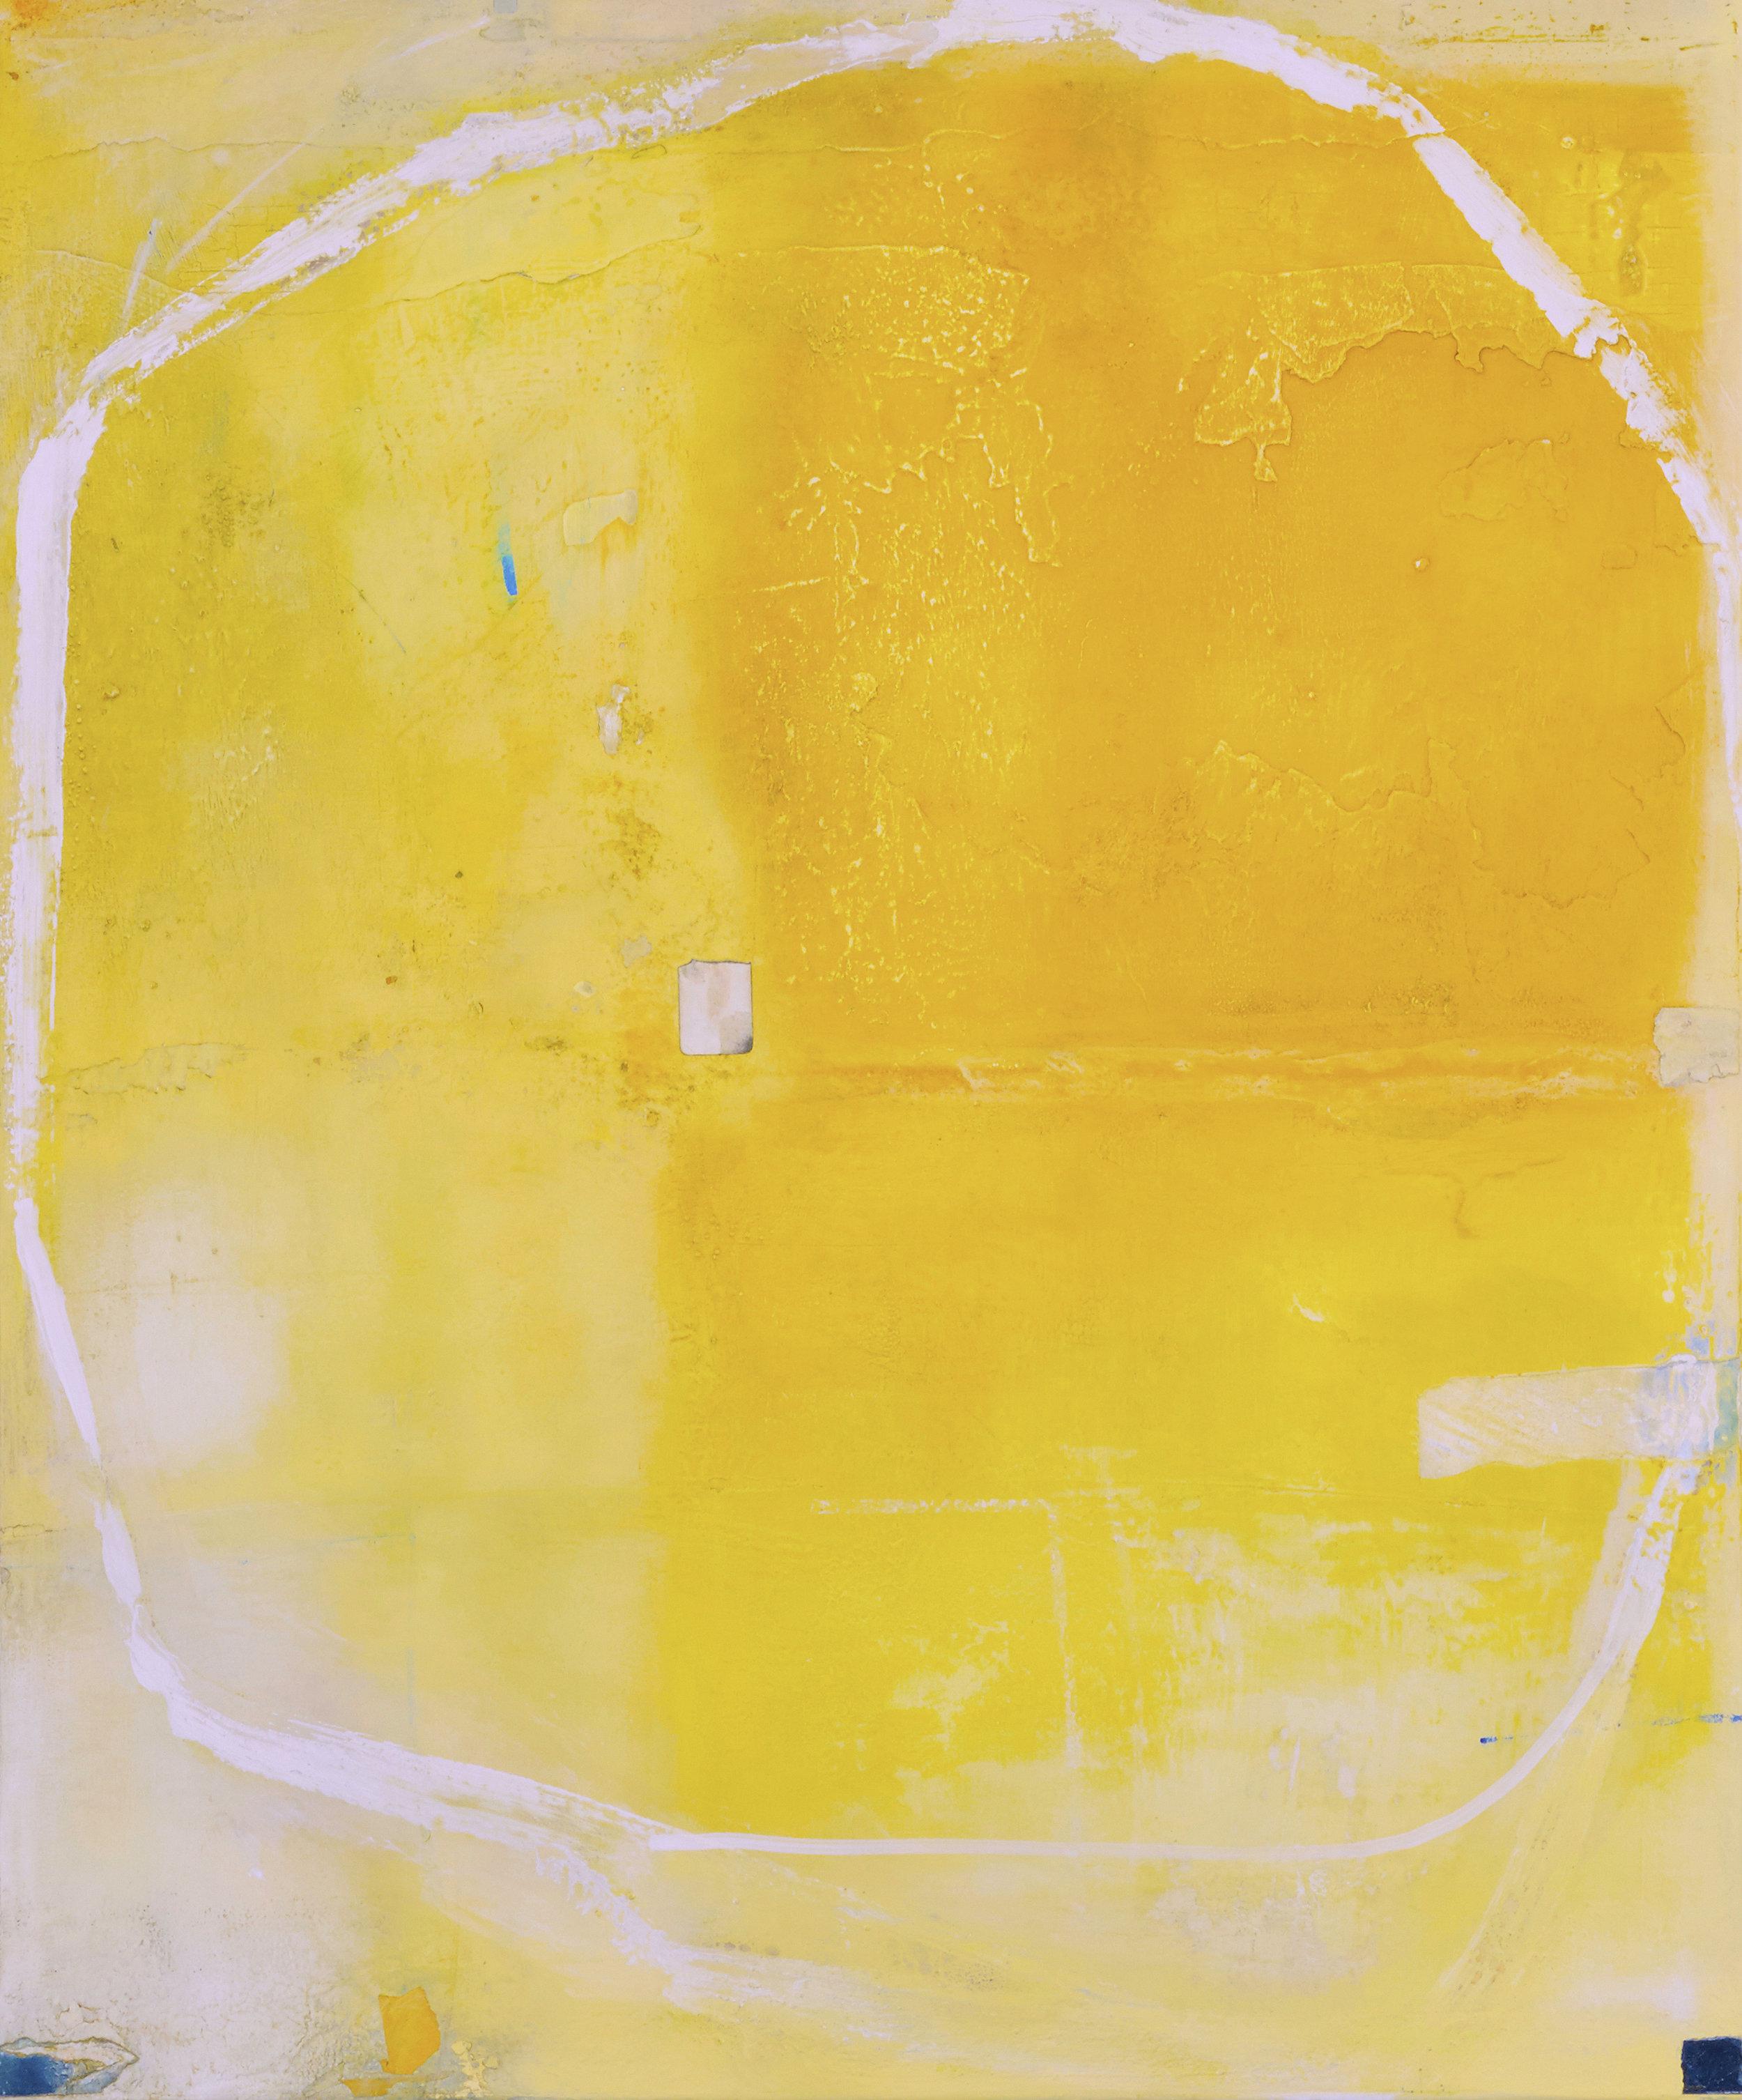 Artist: Sam Lock  Title: On the Edge  Size: 120 x 100 cm  Medium: Oil on canvas  Price: £8000